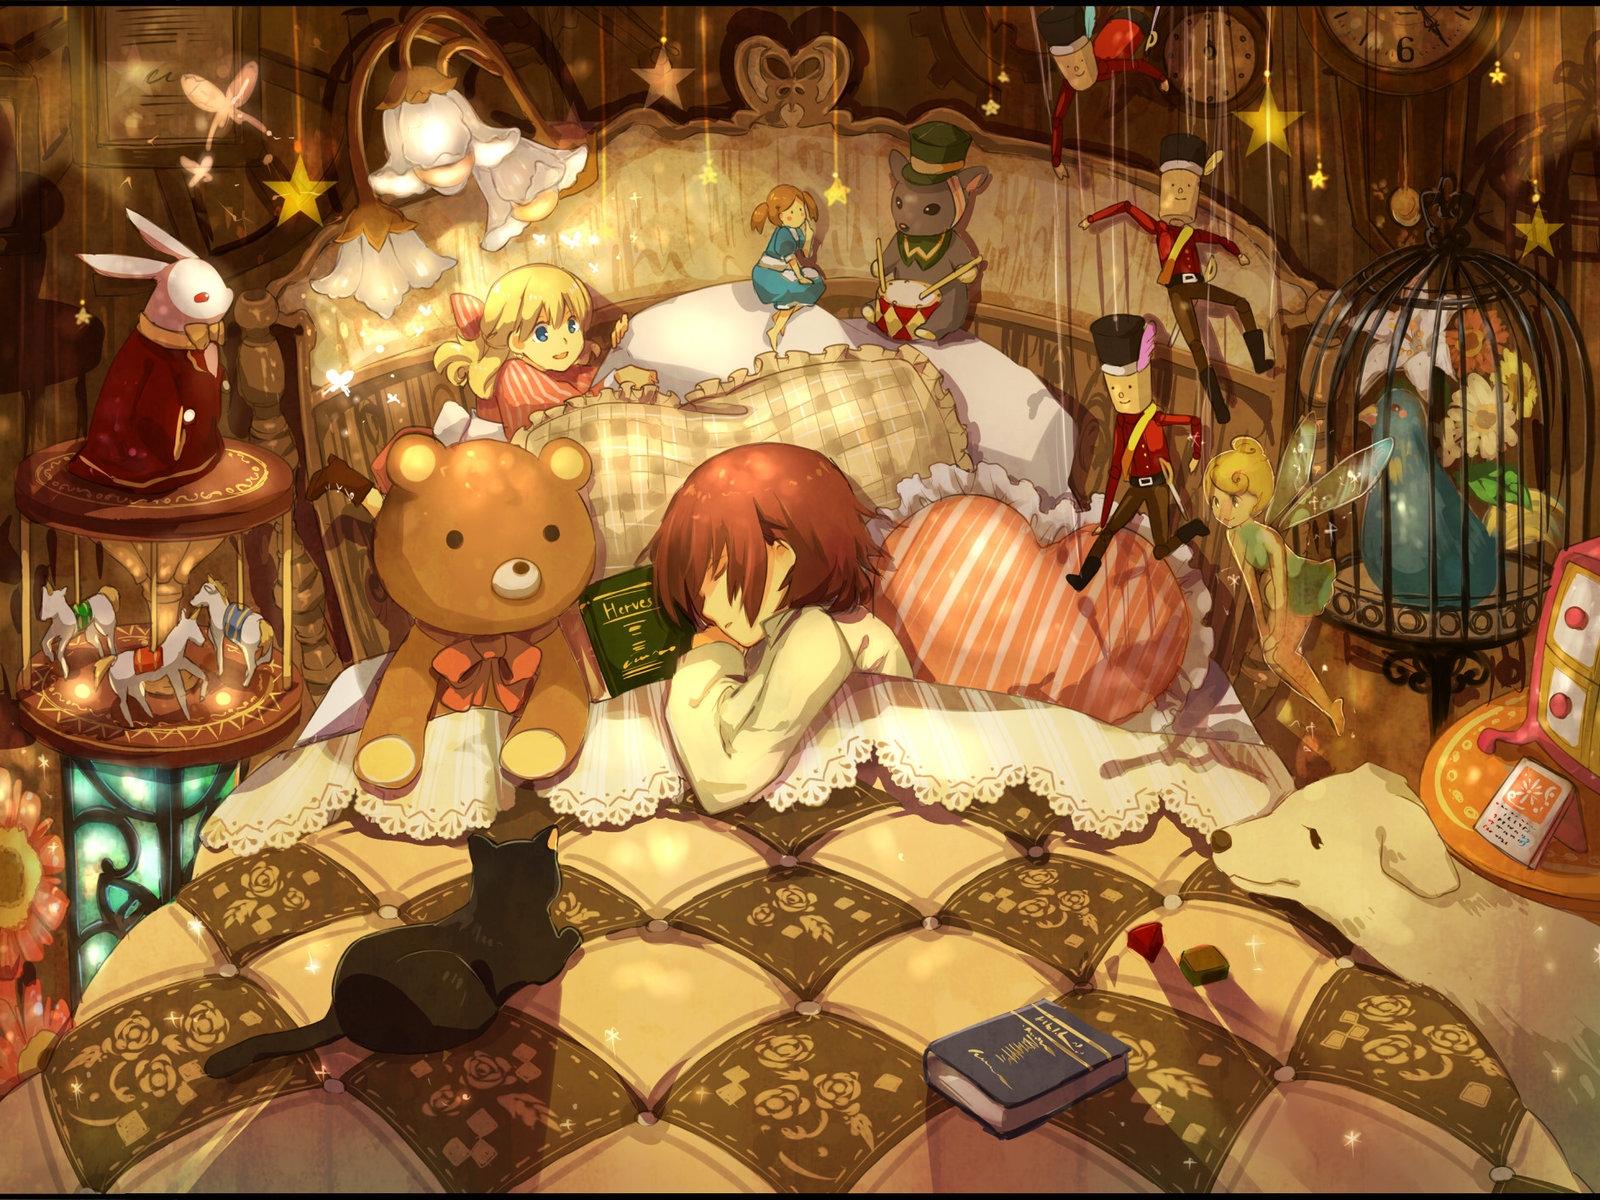 Wallpaper Room Childhood Disorder Bedding Toys